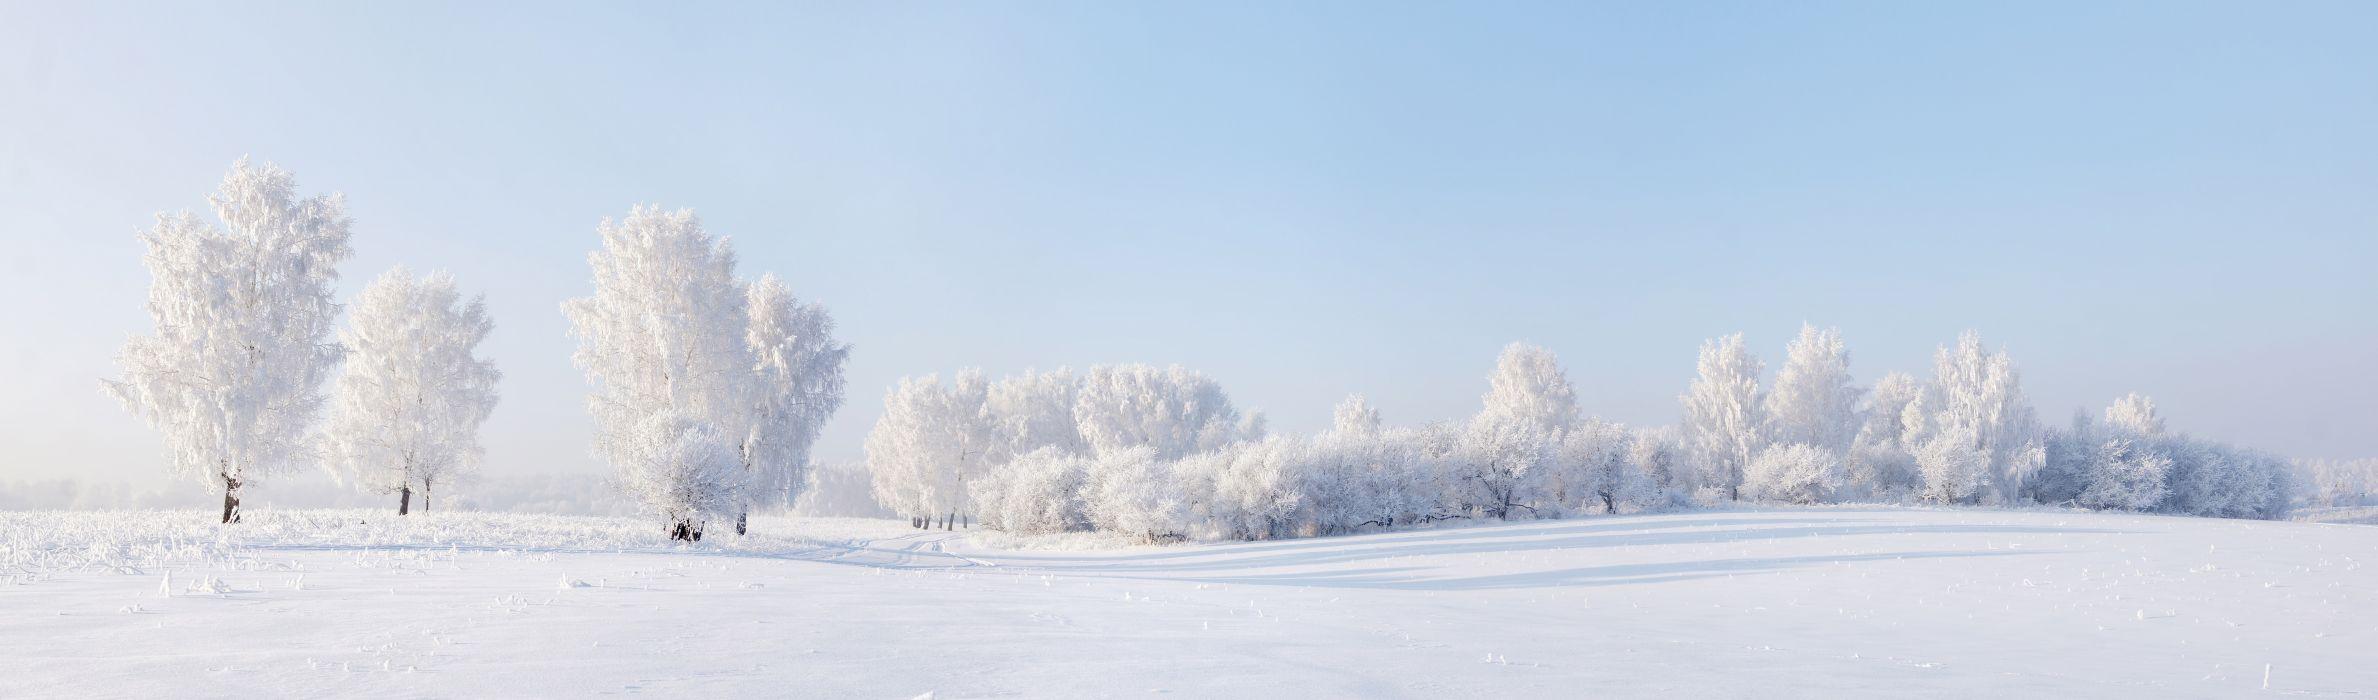 nature winter landscape snow wallpaper